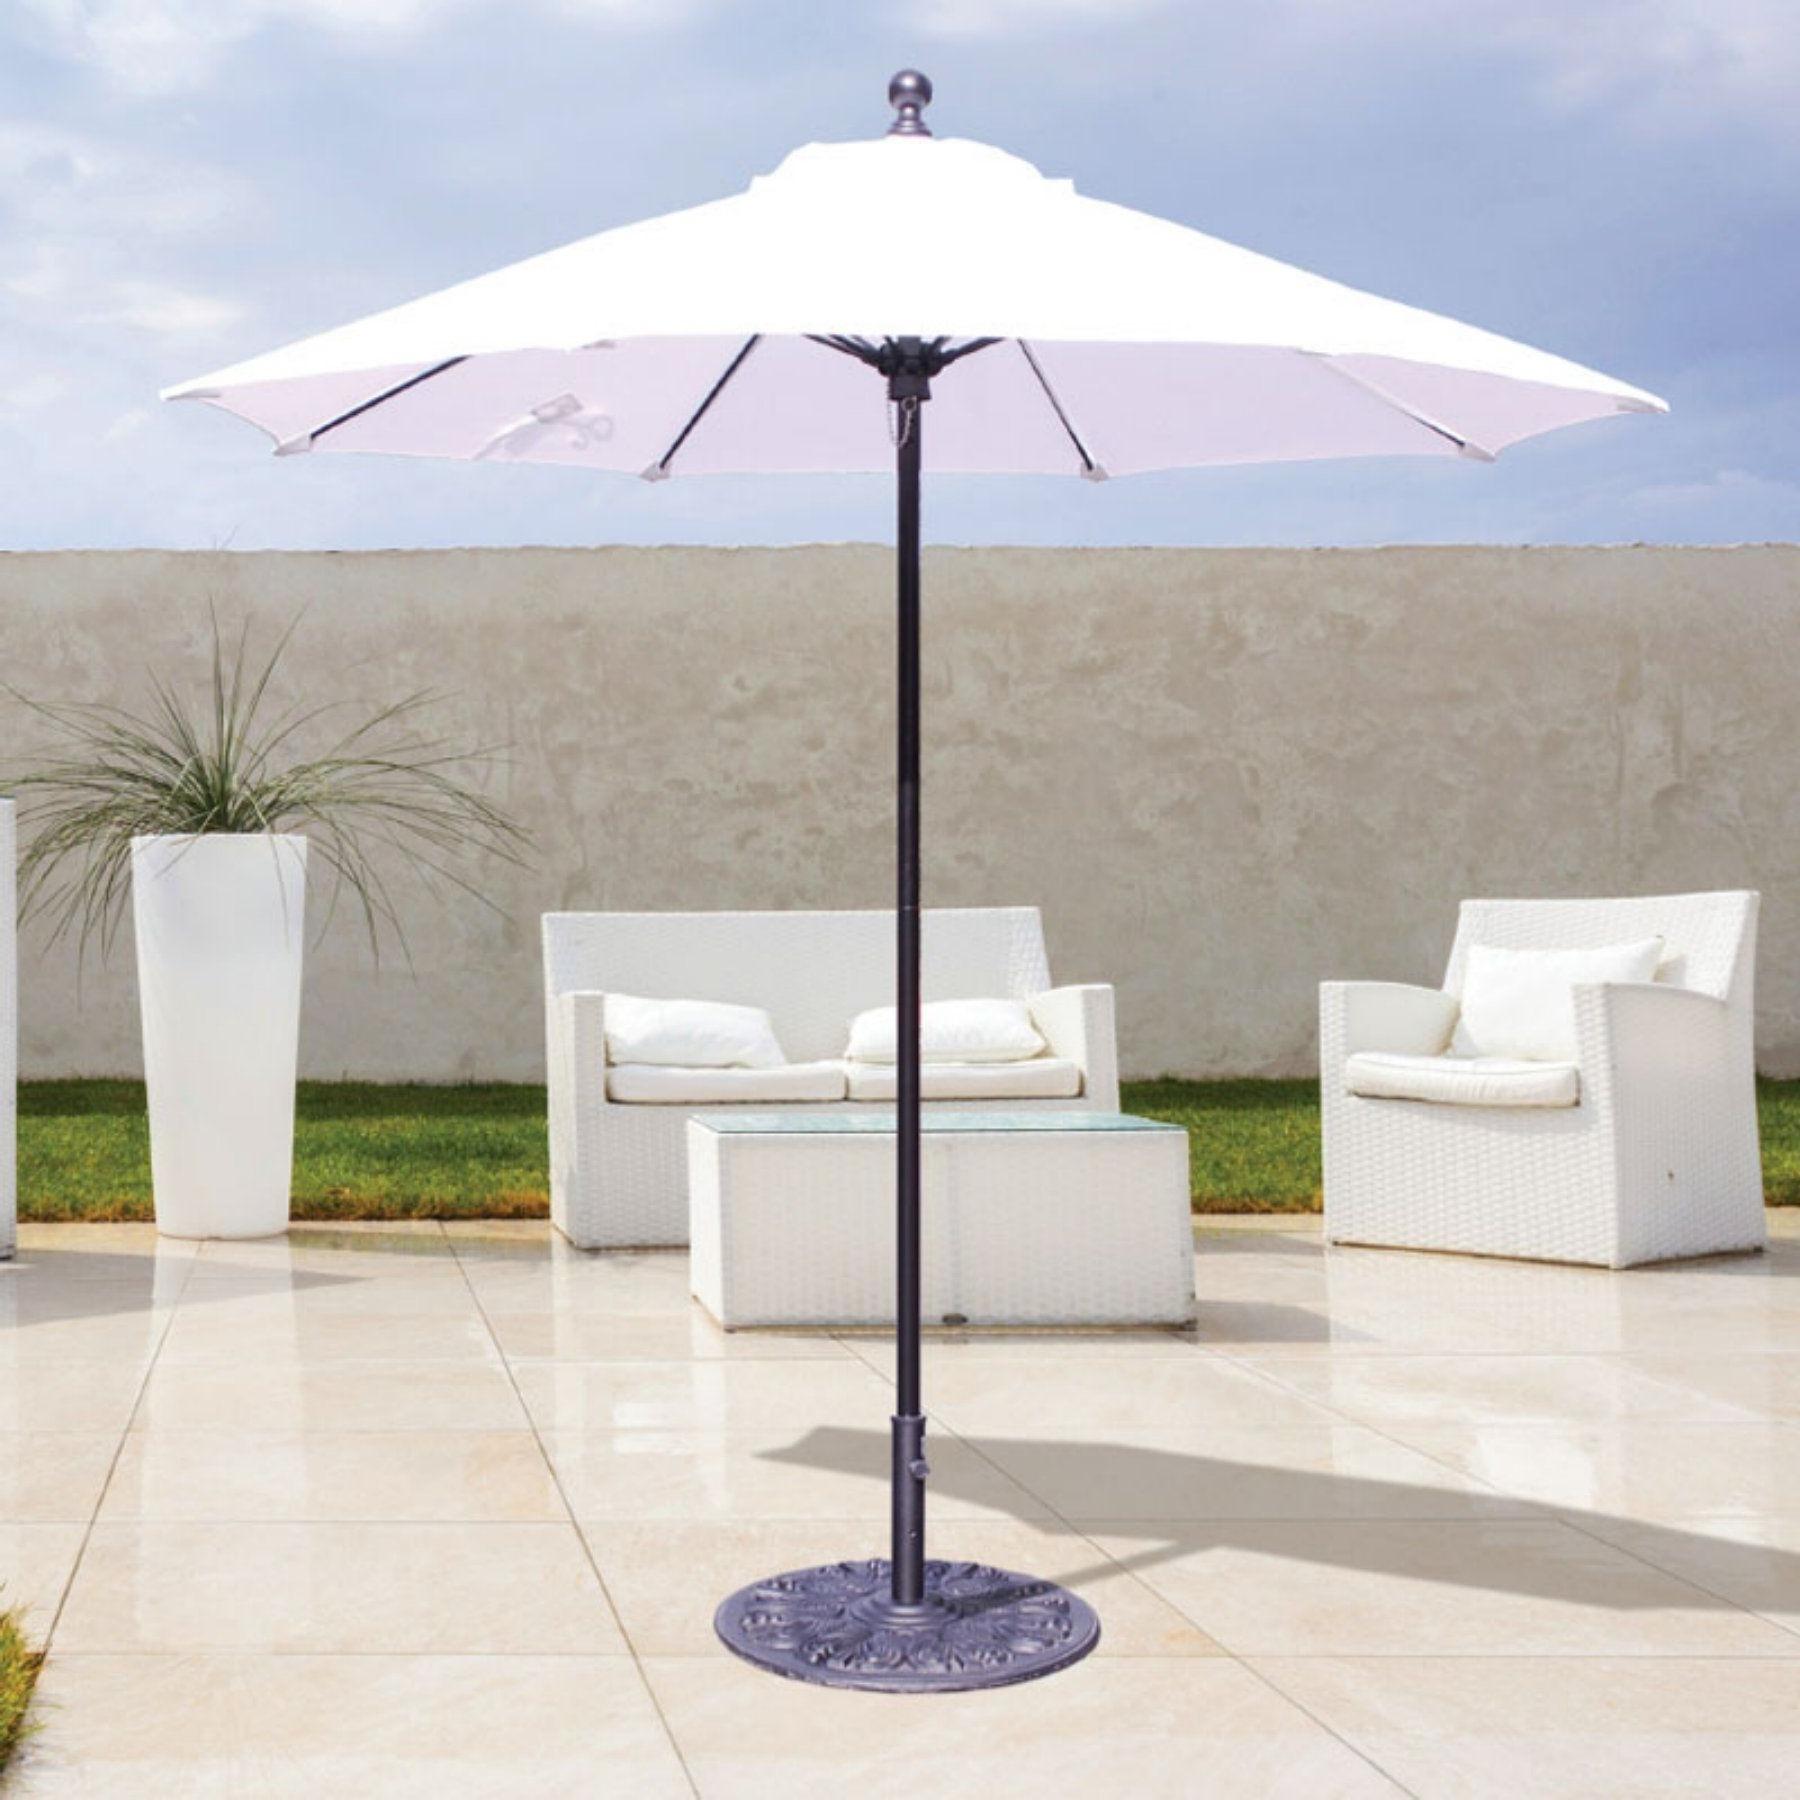 Galtech 7.5 Ft. Sunbrella Commercial Patio Umbrella – 725W 45 Regarding Popular Commercial Patio Umbrellas Sunbrella (Gallery 18 of 20)